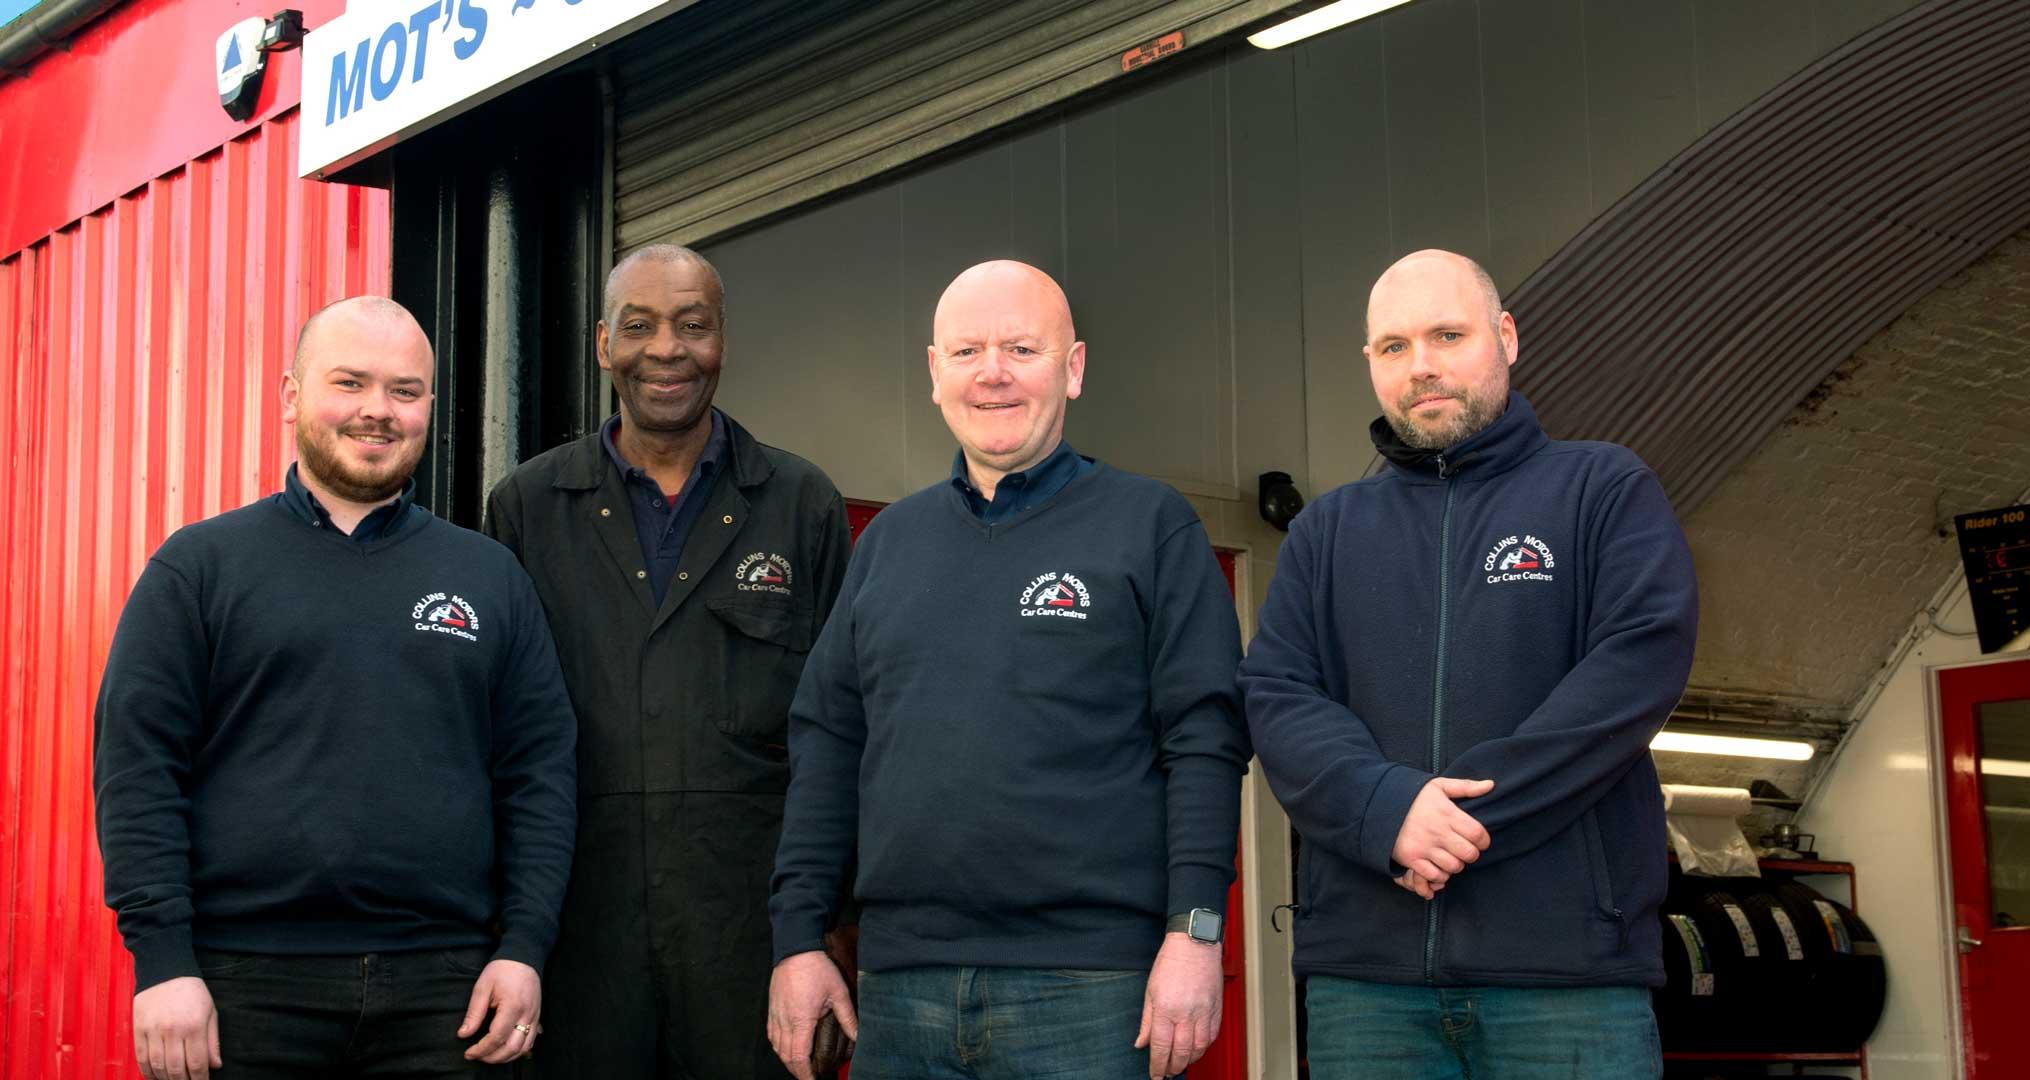 Hammersmith Motor Repairs and MOT: Collins Motors – Family Values